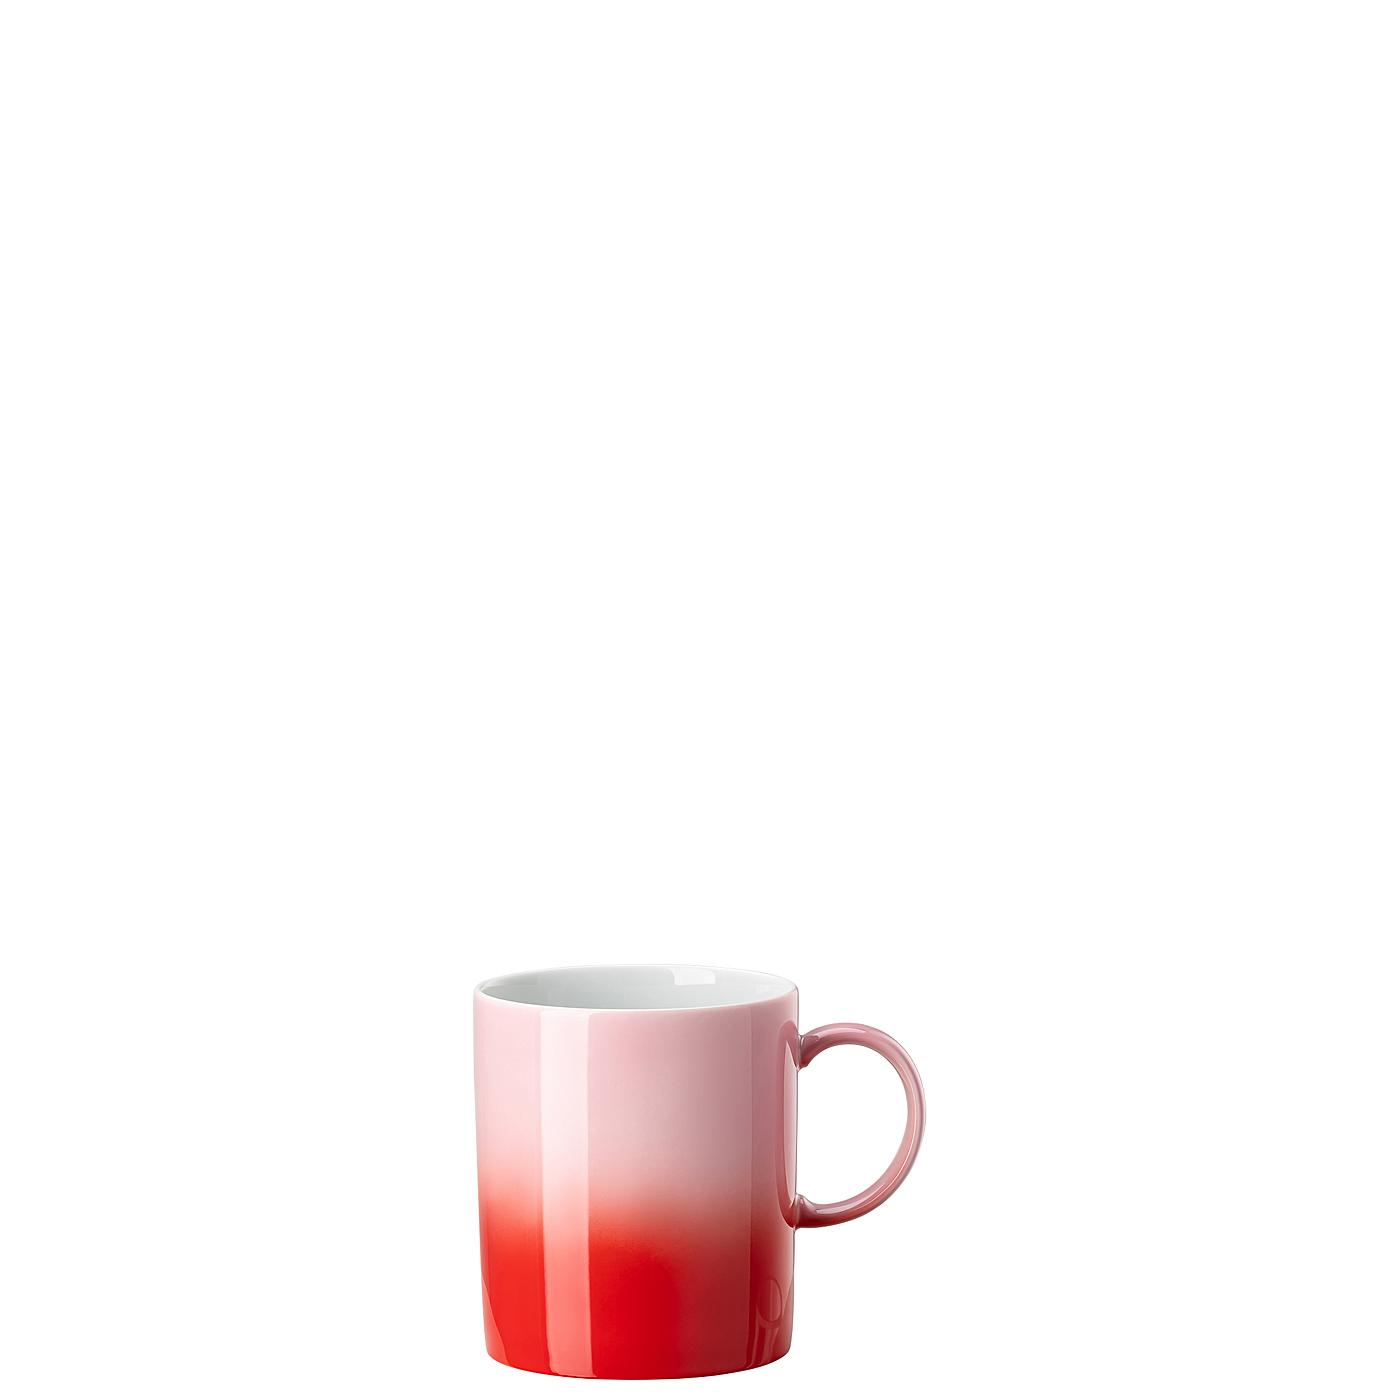 Becher mit Henkel BeColour Susa Pink Thomas Porzellan